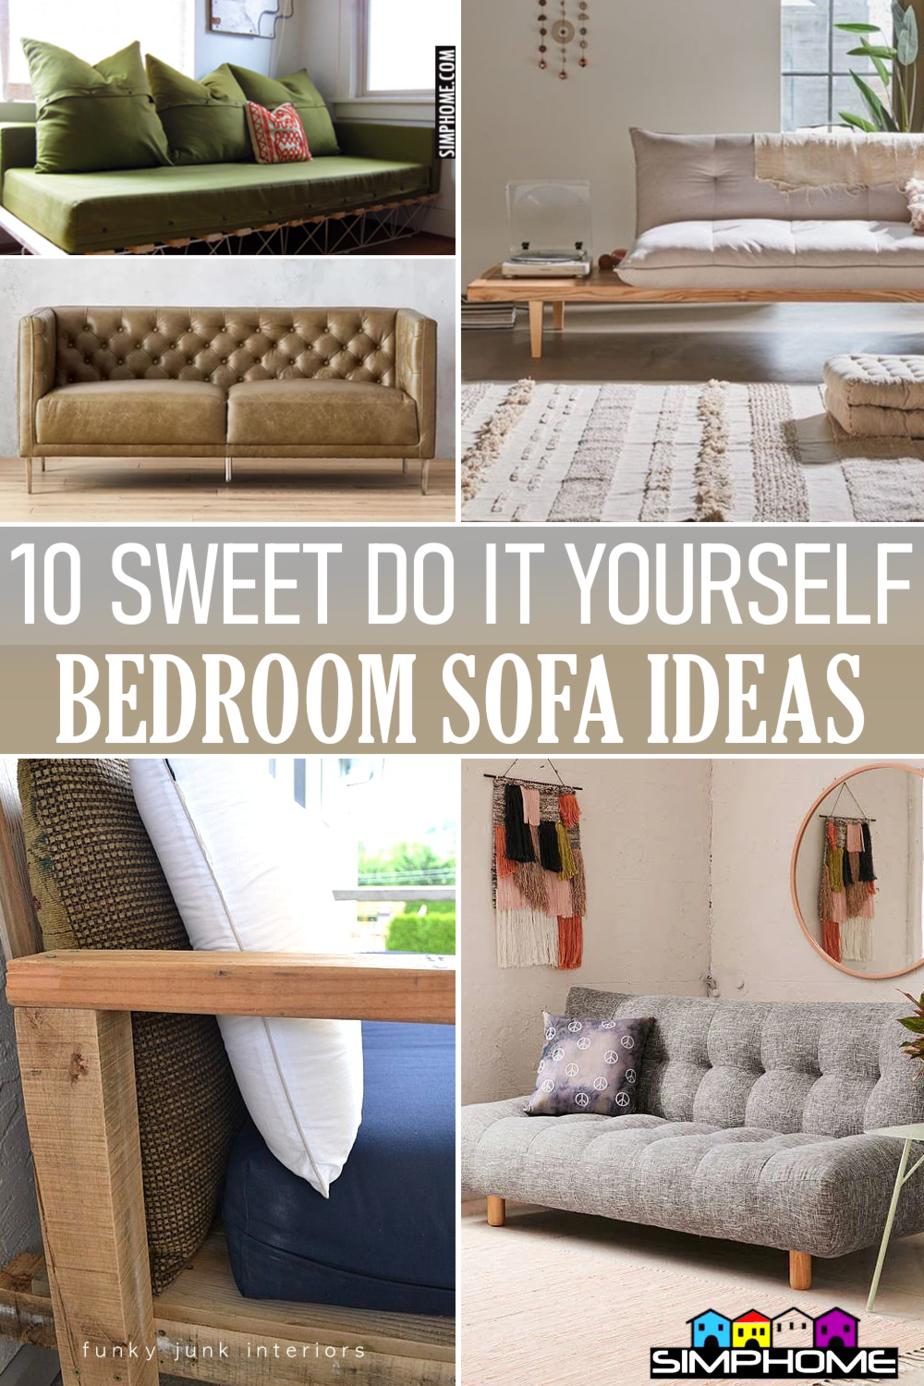 10 Bedroom Sofa Ideas via Simphome.com Featured